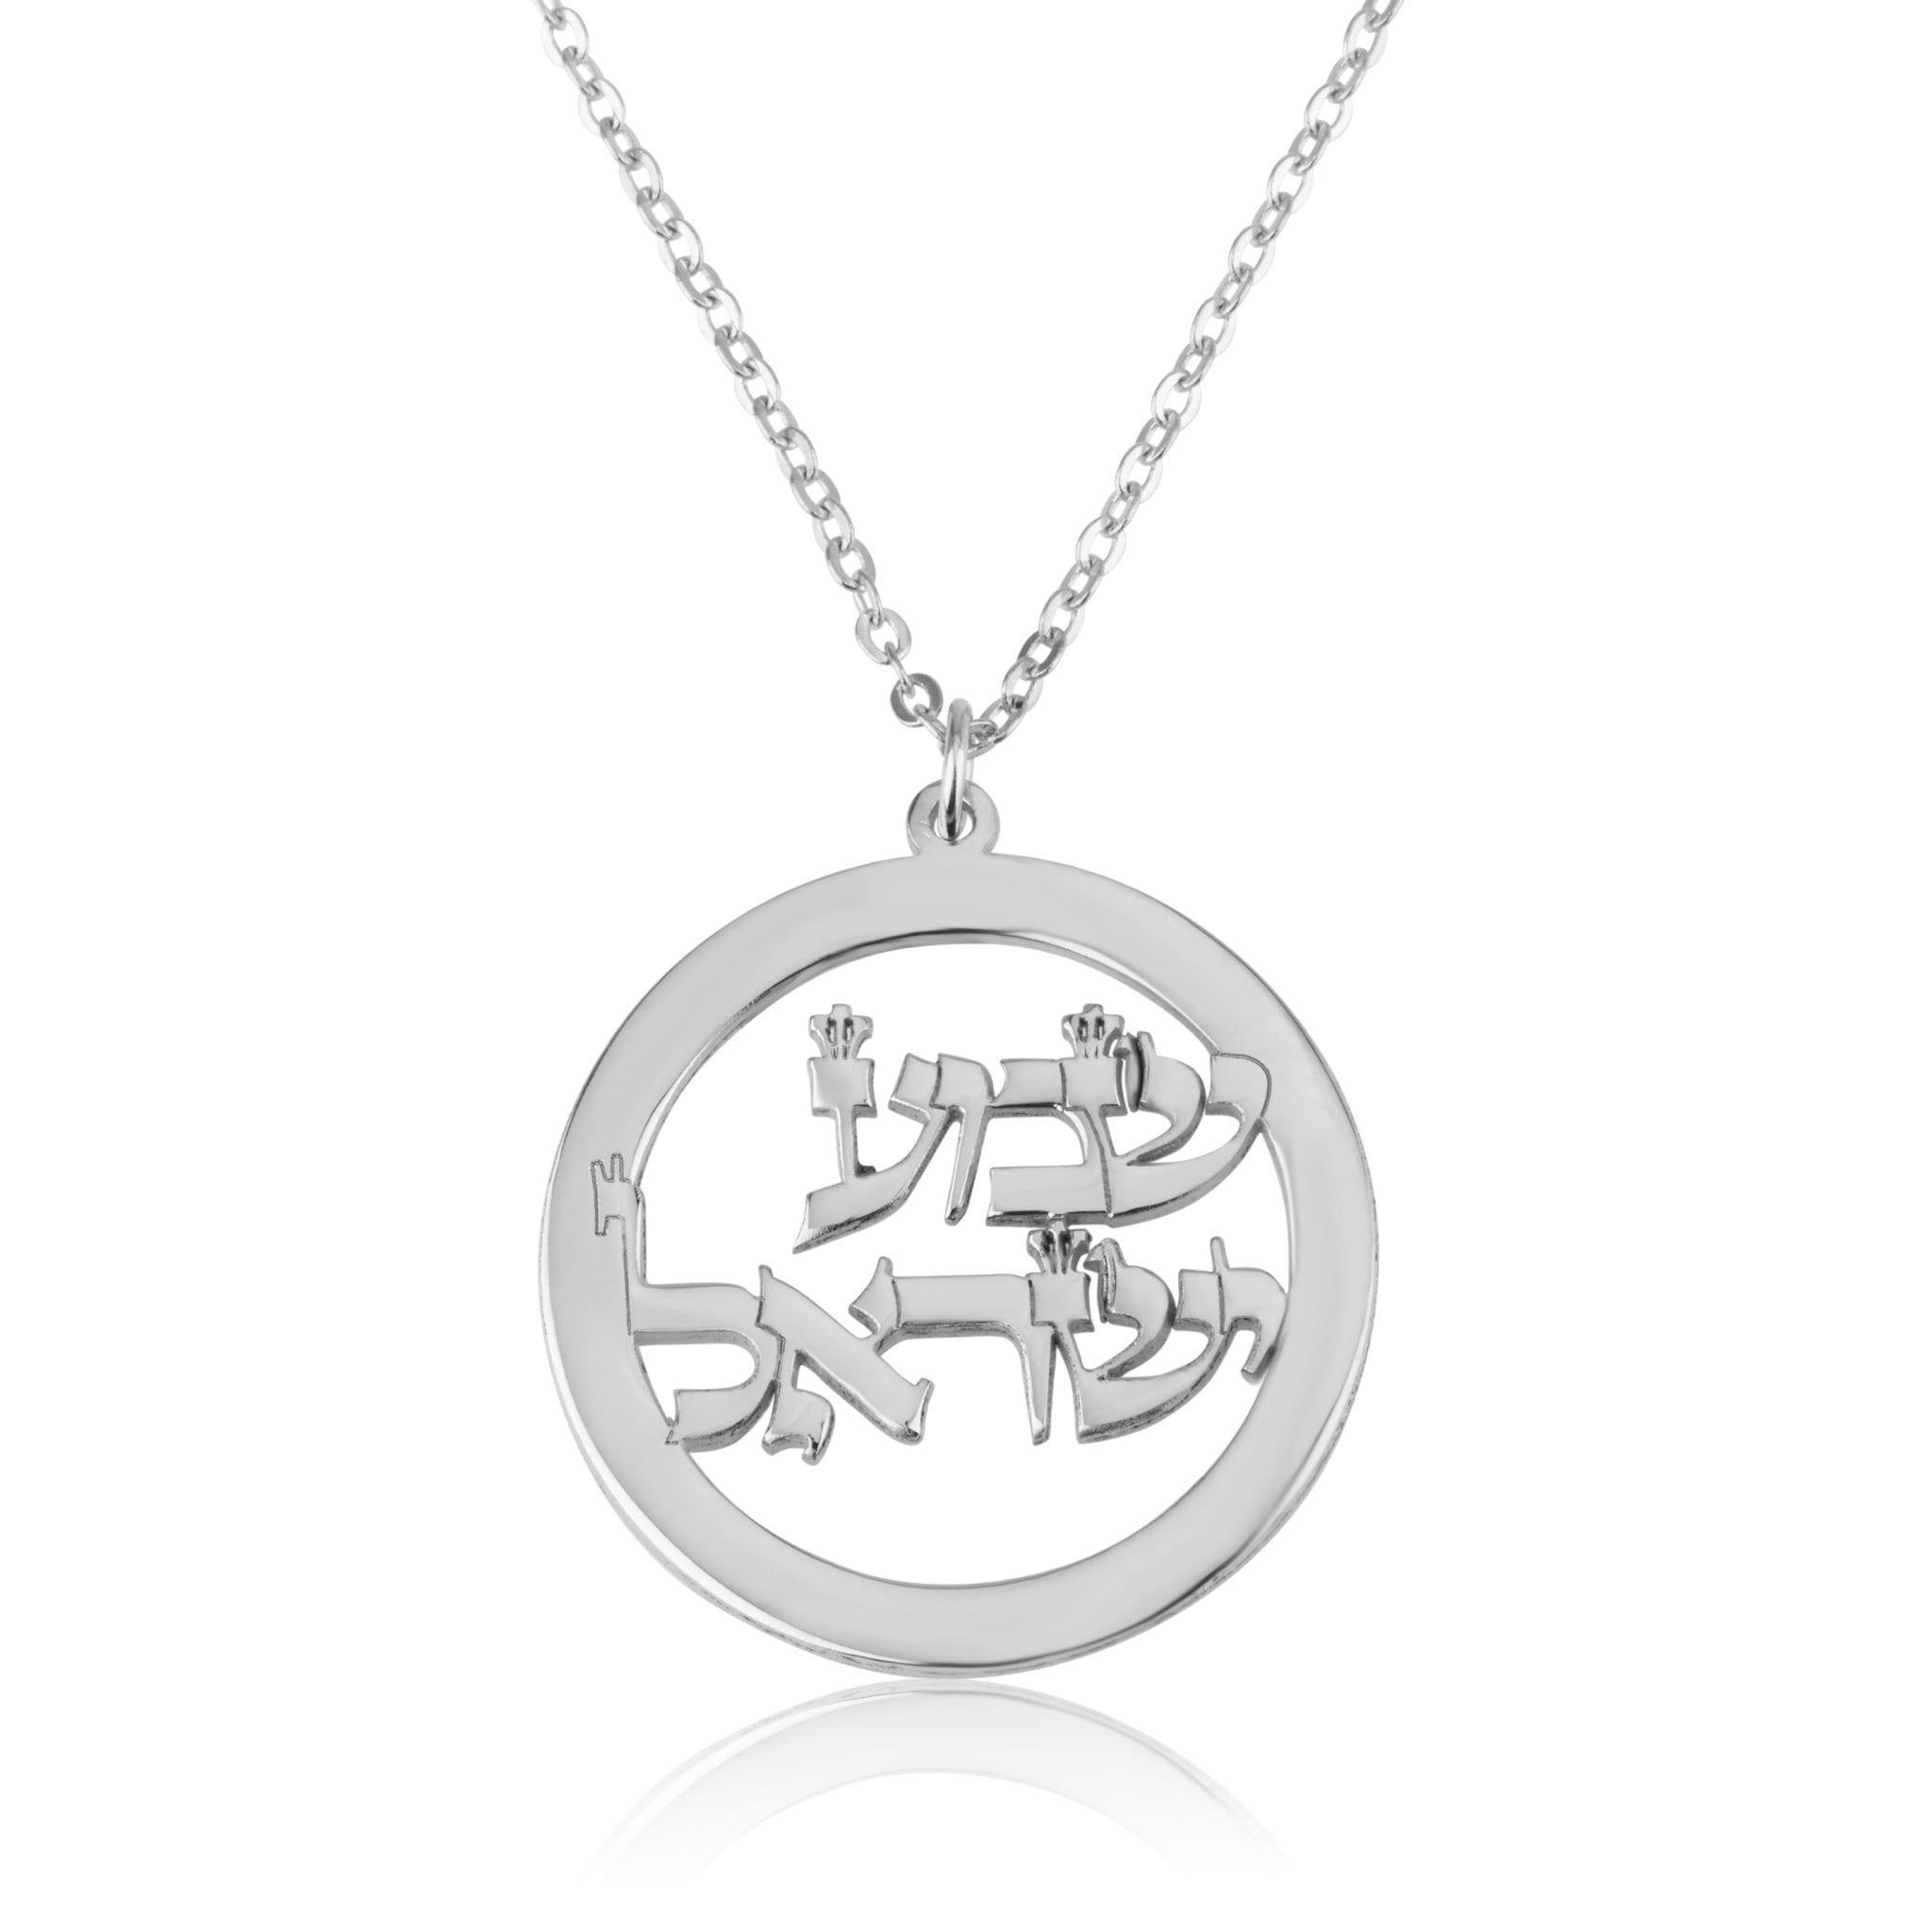 Shema Israel Necklace - שמע ישראל - Beleco Jewelry